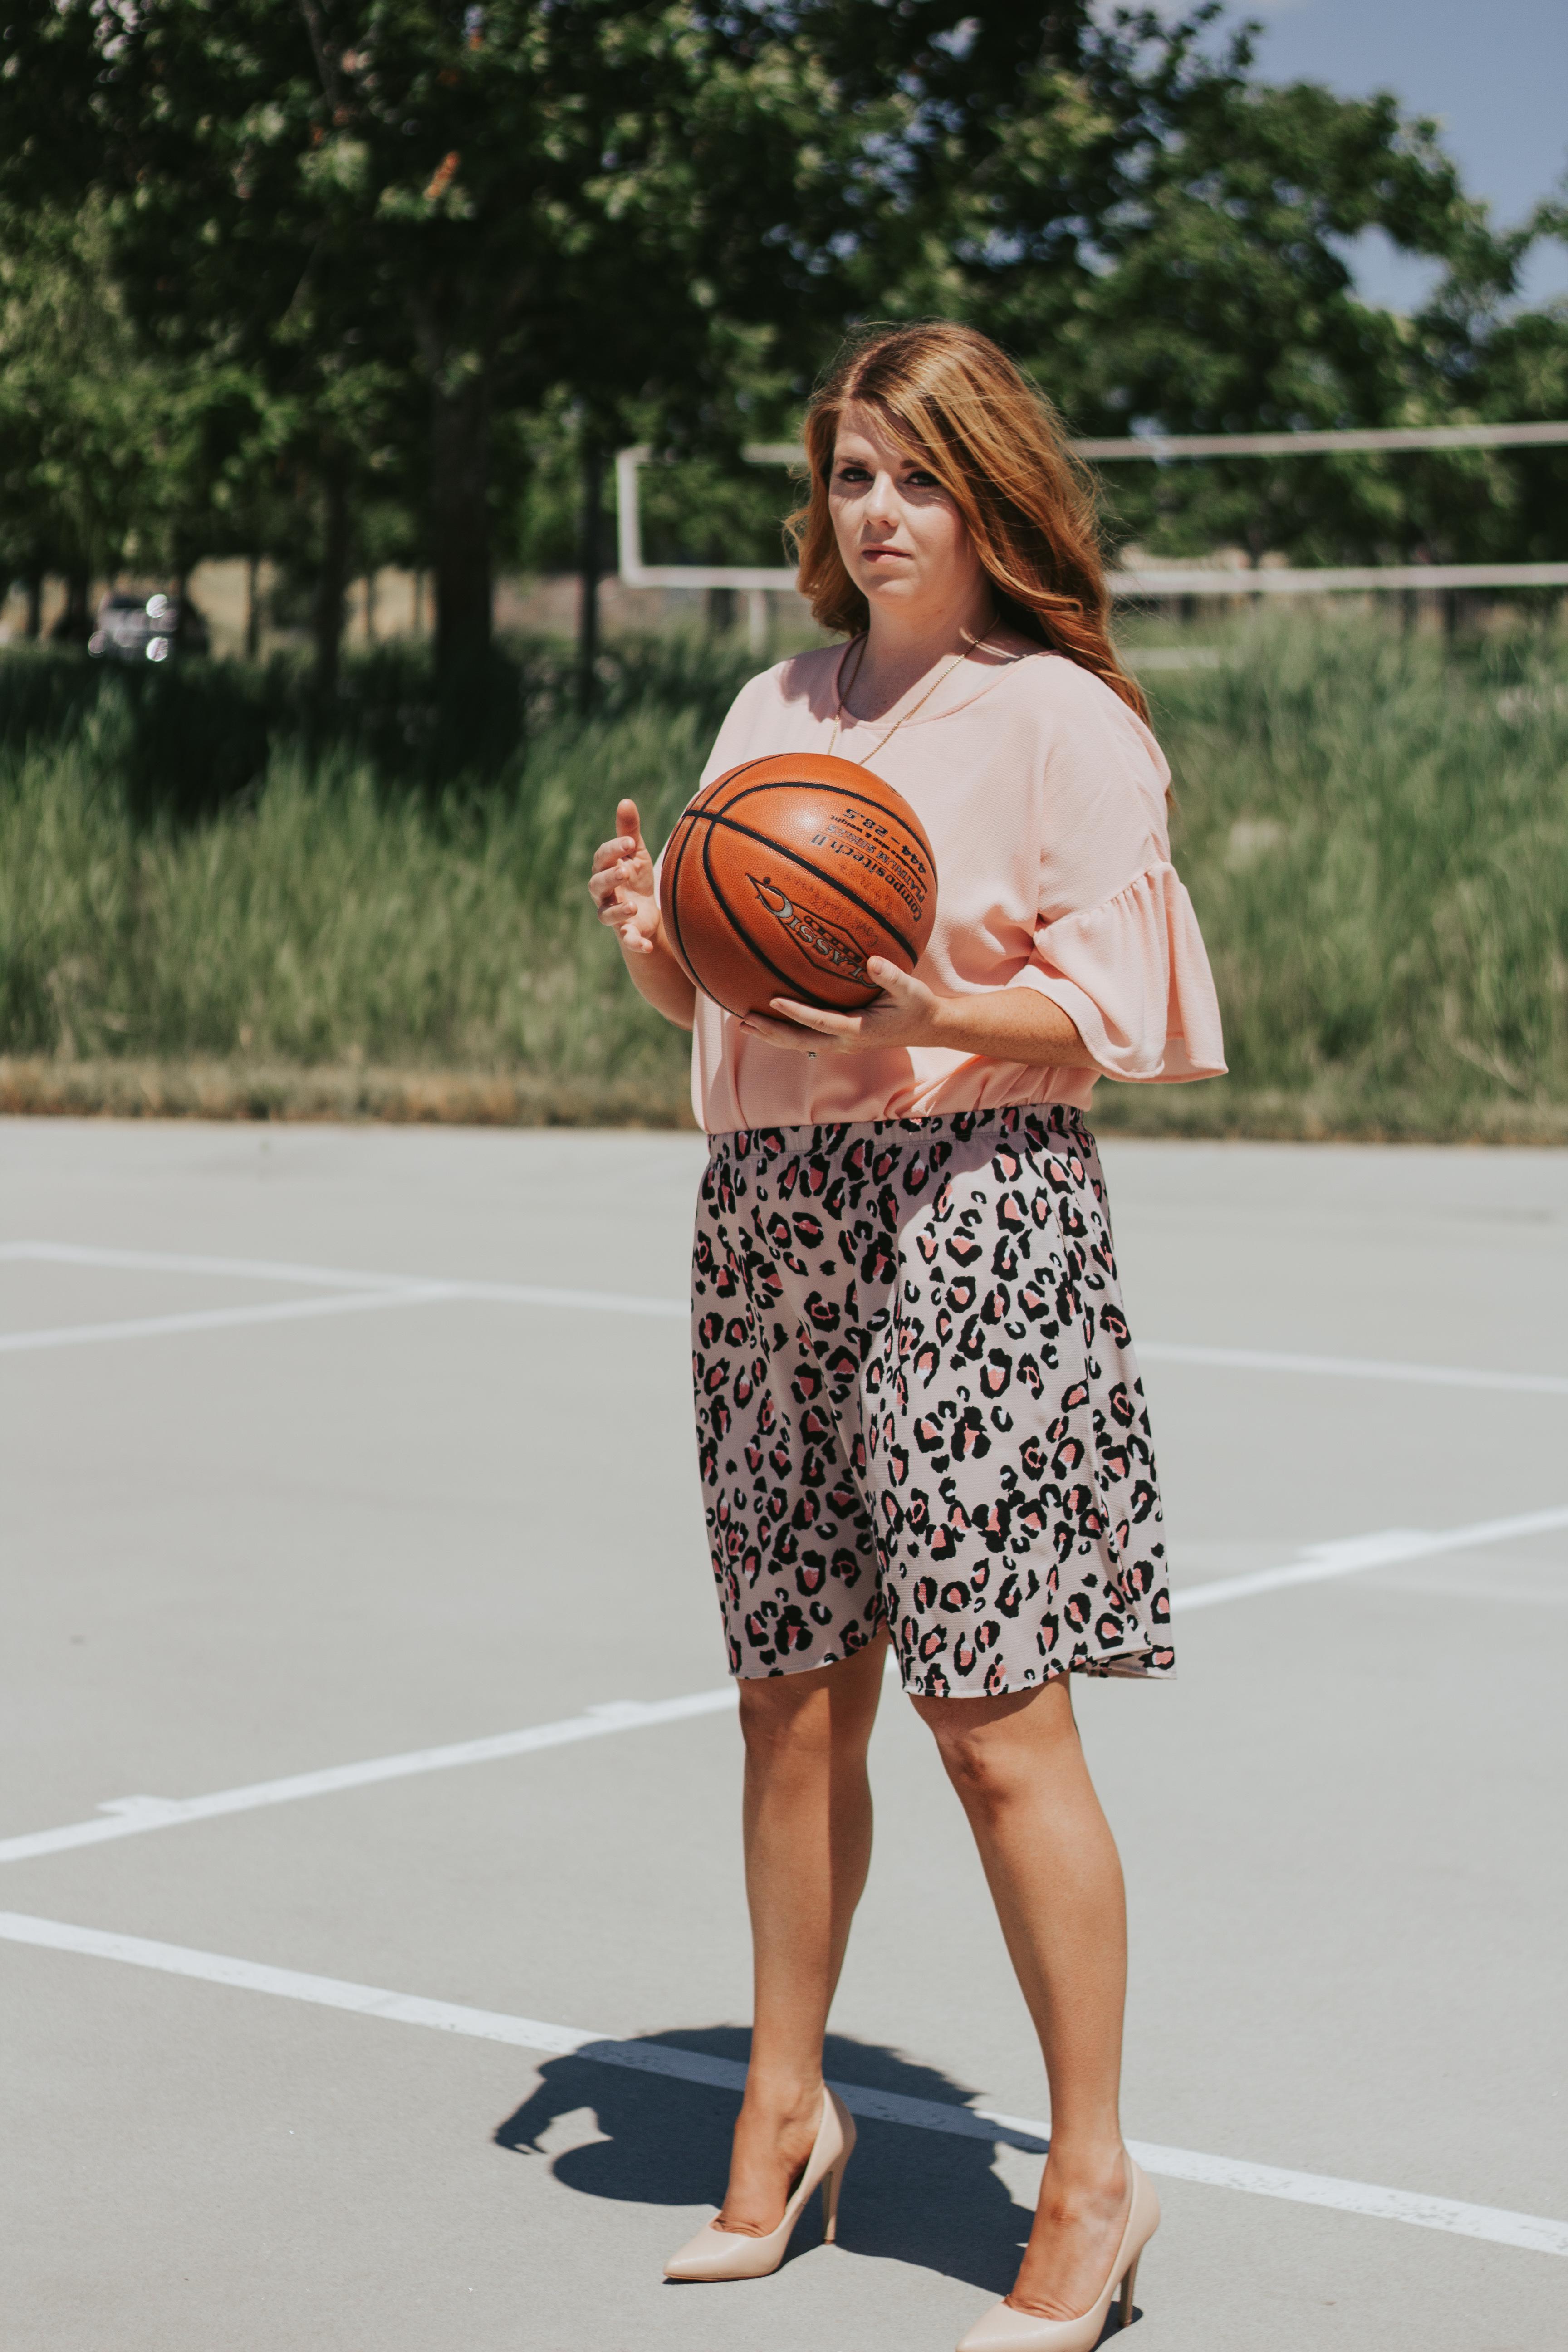 fashionable shorts on a budget